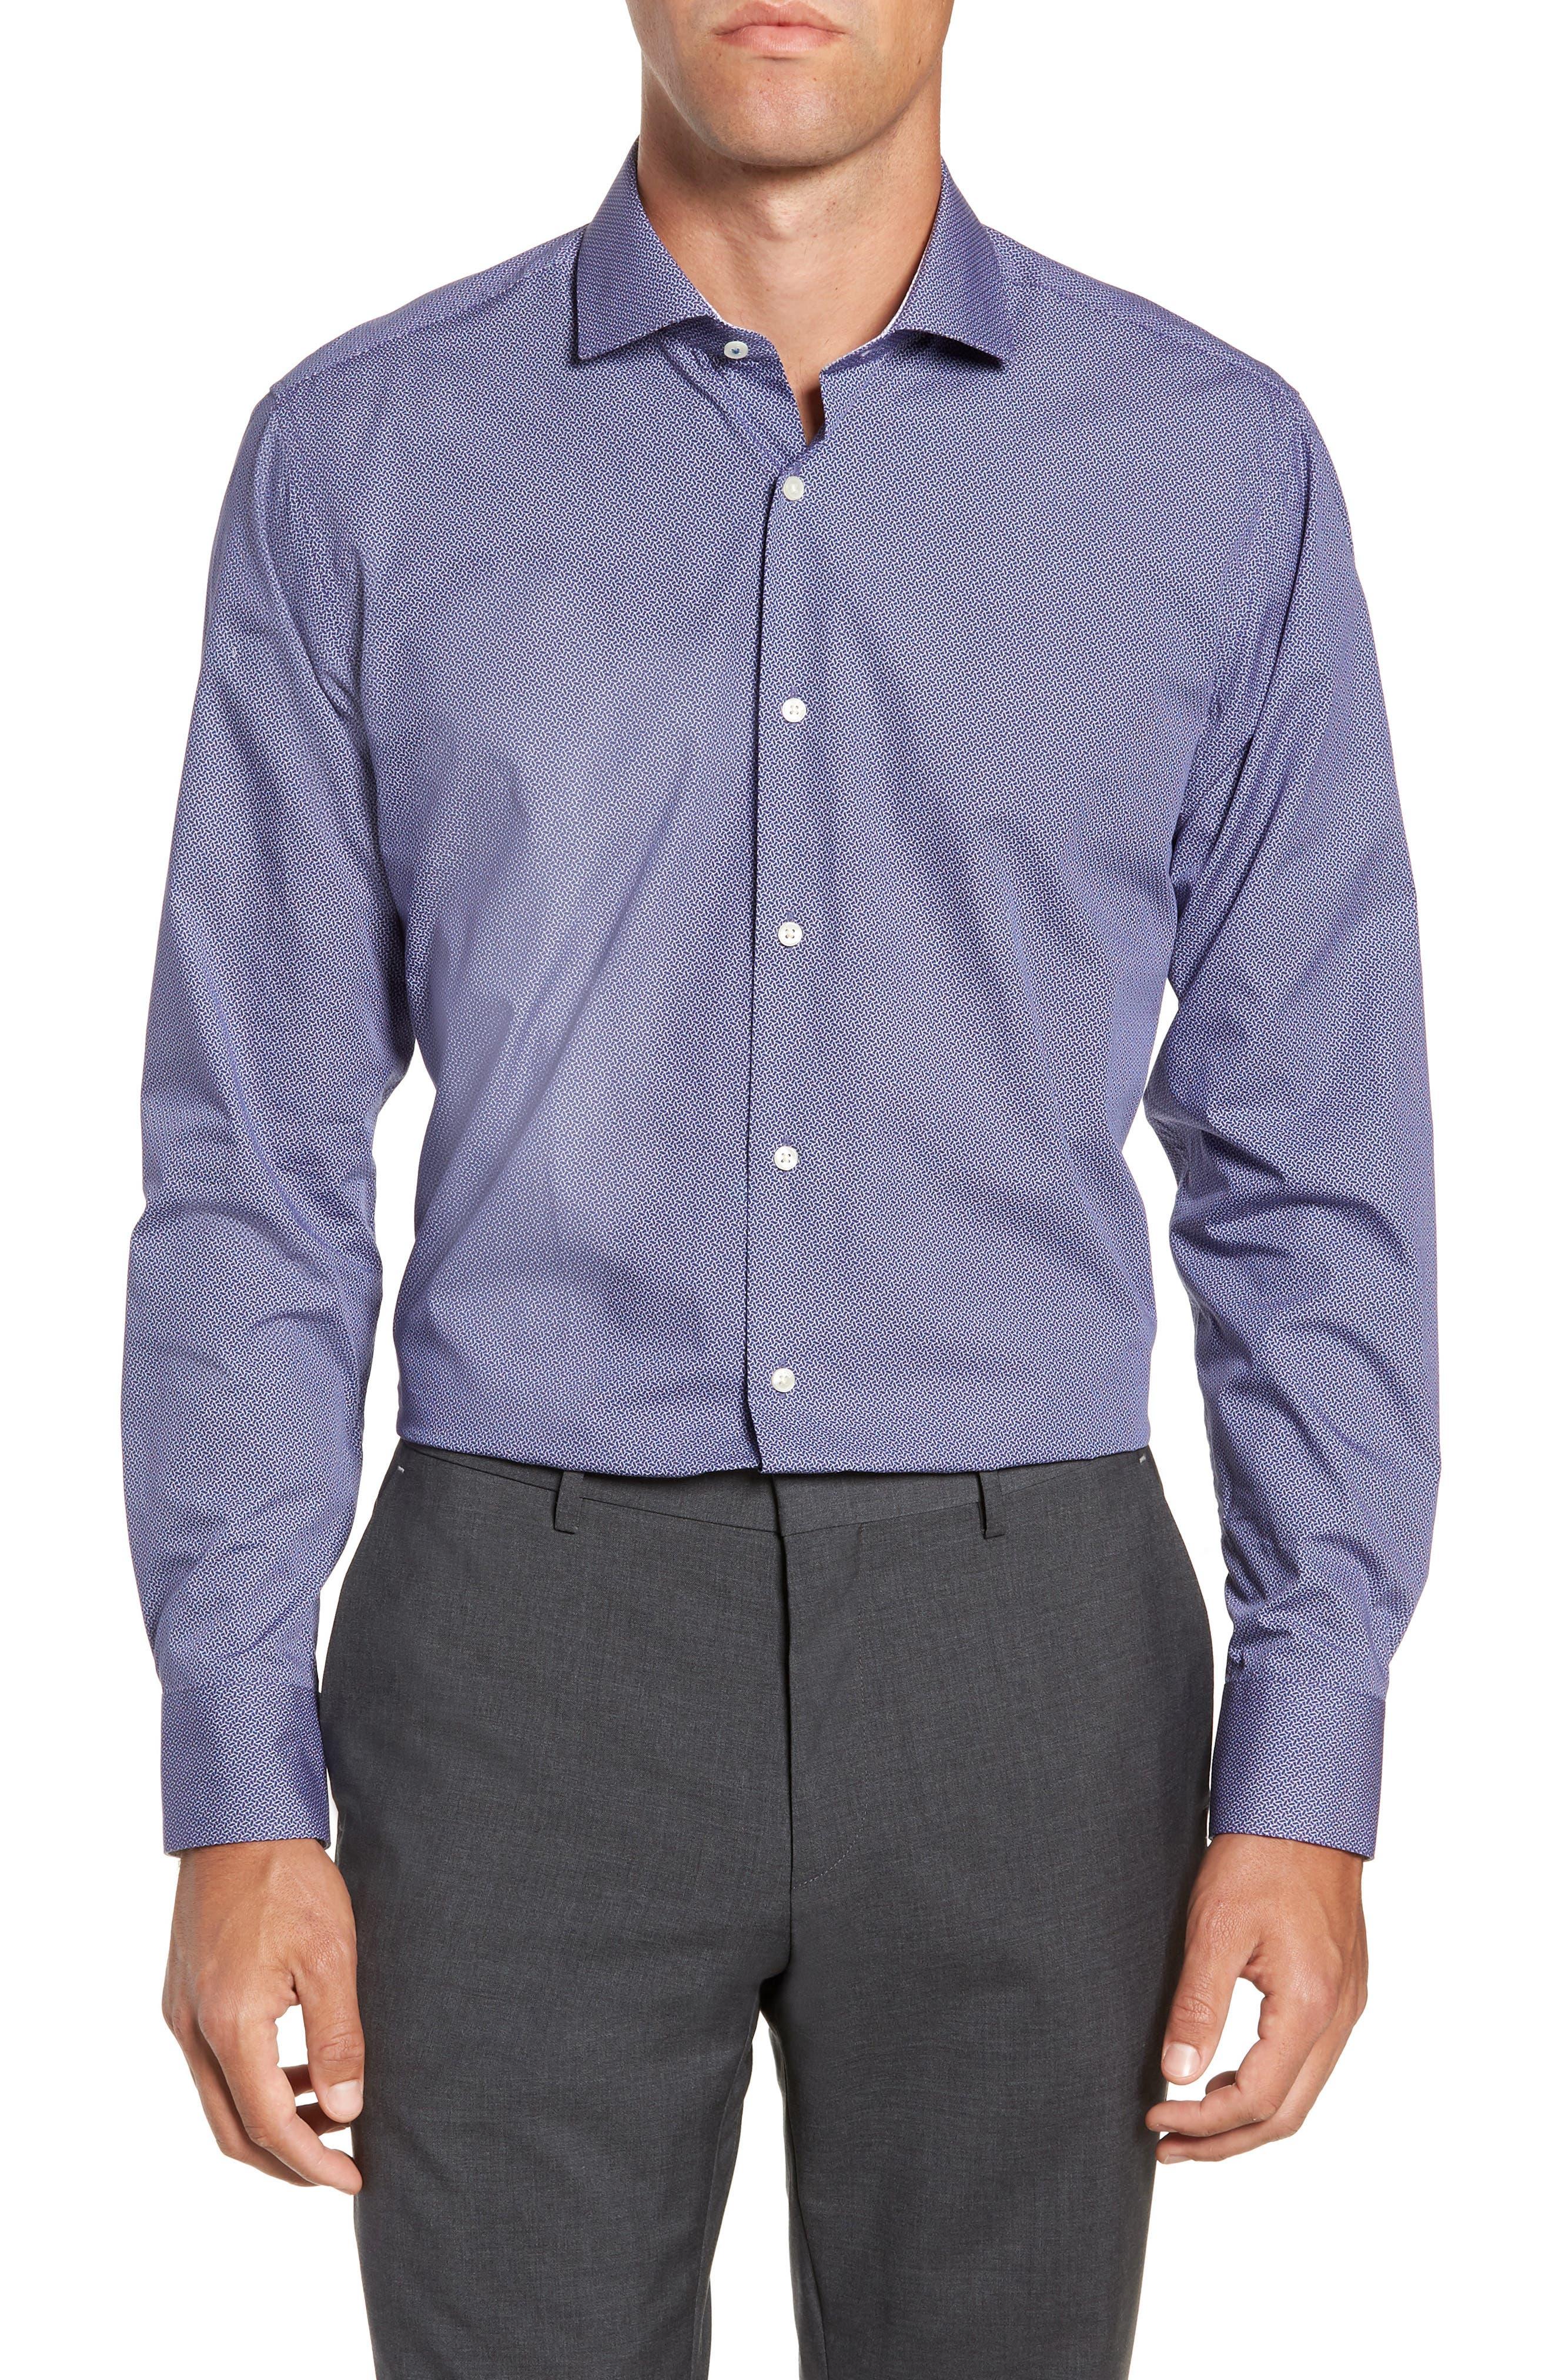 Strame Slim Fit Geometric Dress Shirt,                         Main,                         color, 510